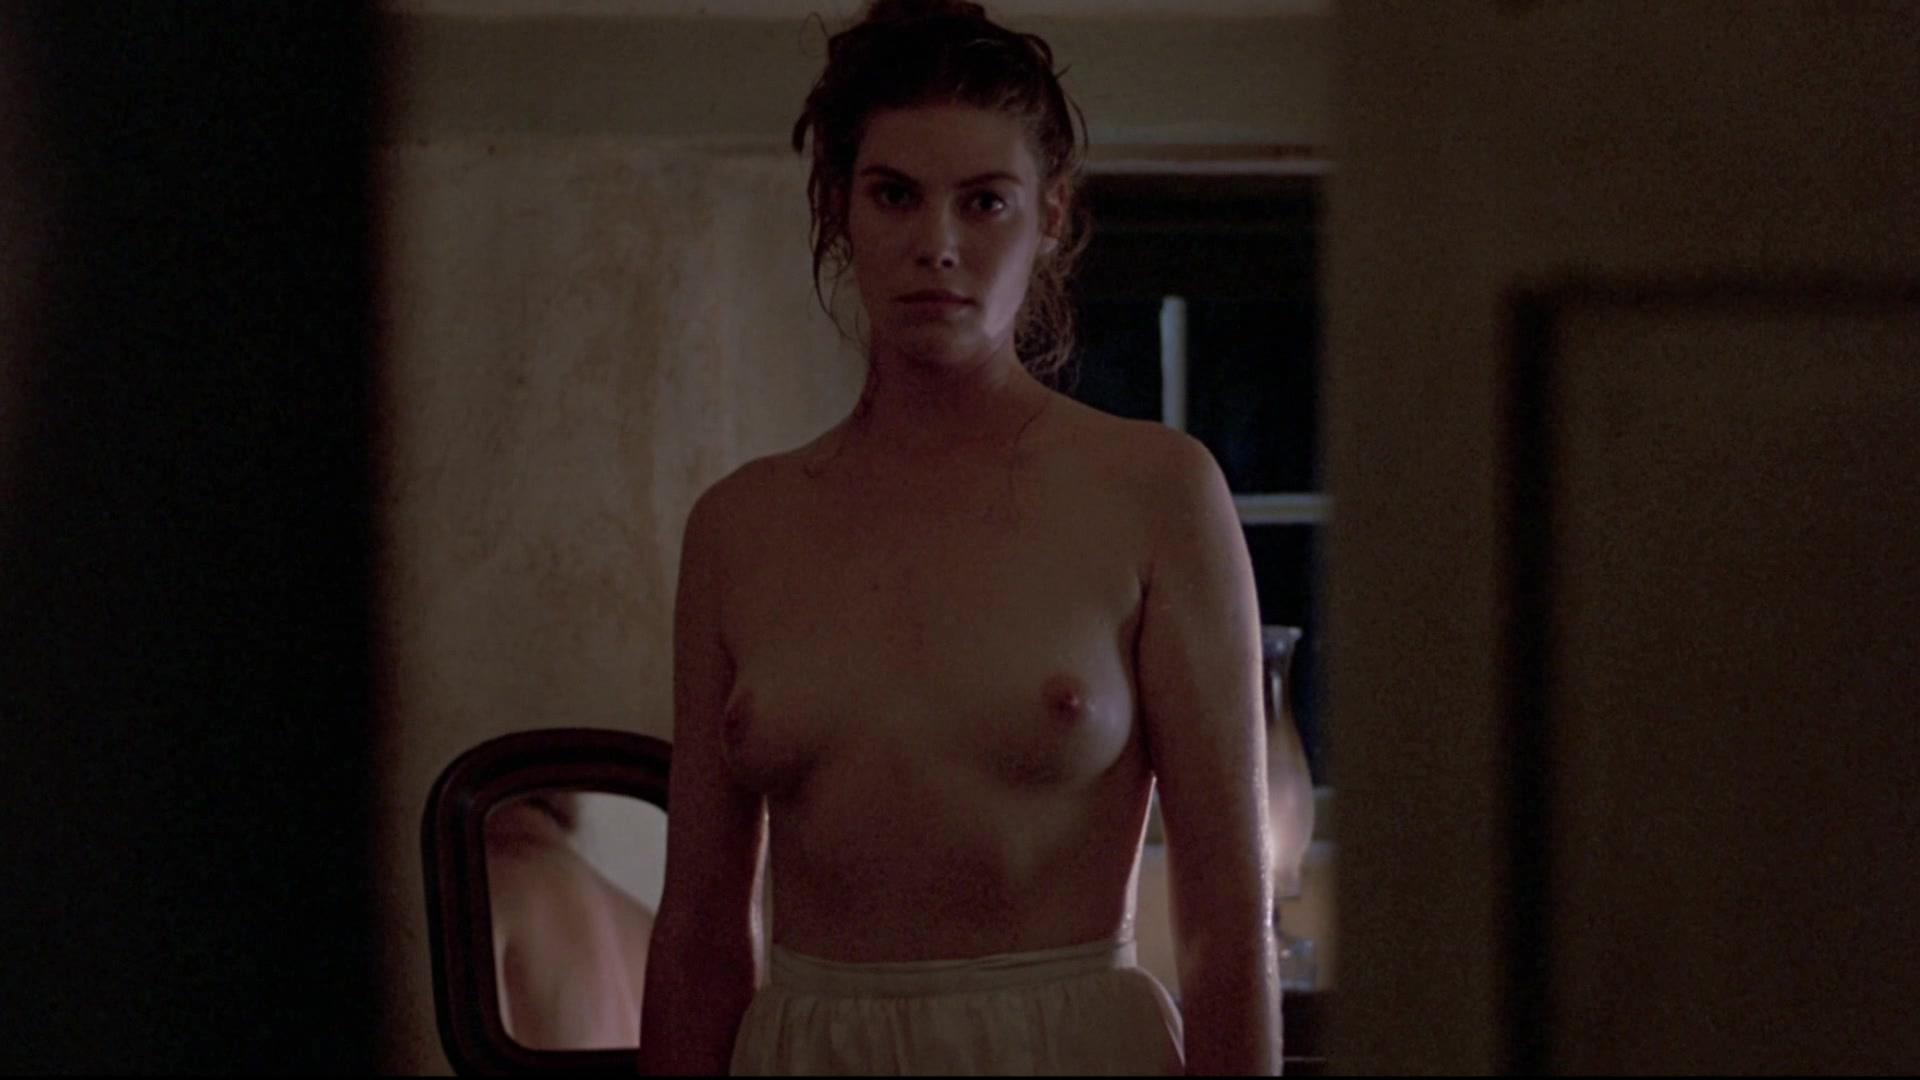 Jessica burciaga naked pics